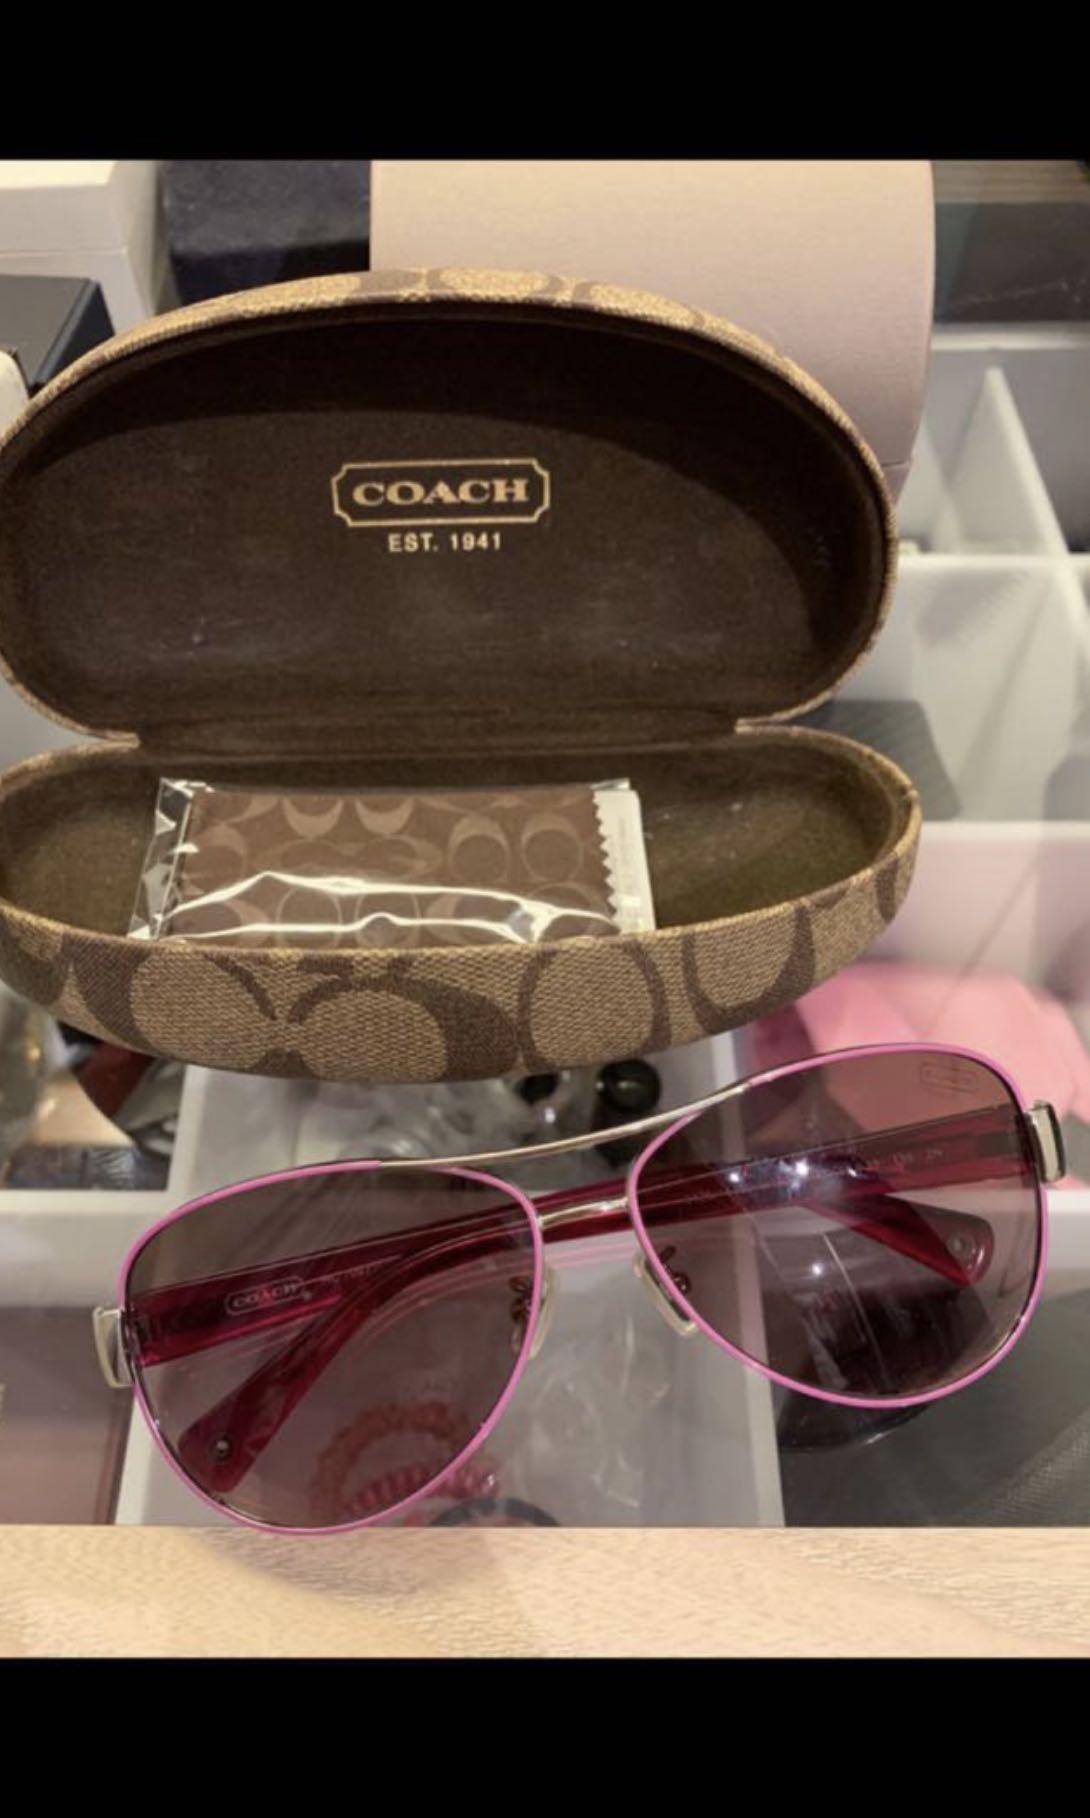 41b320a16183 Coach Sunglasses brand new, Women's Fashion, Accessories, Eyewear ...